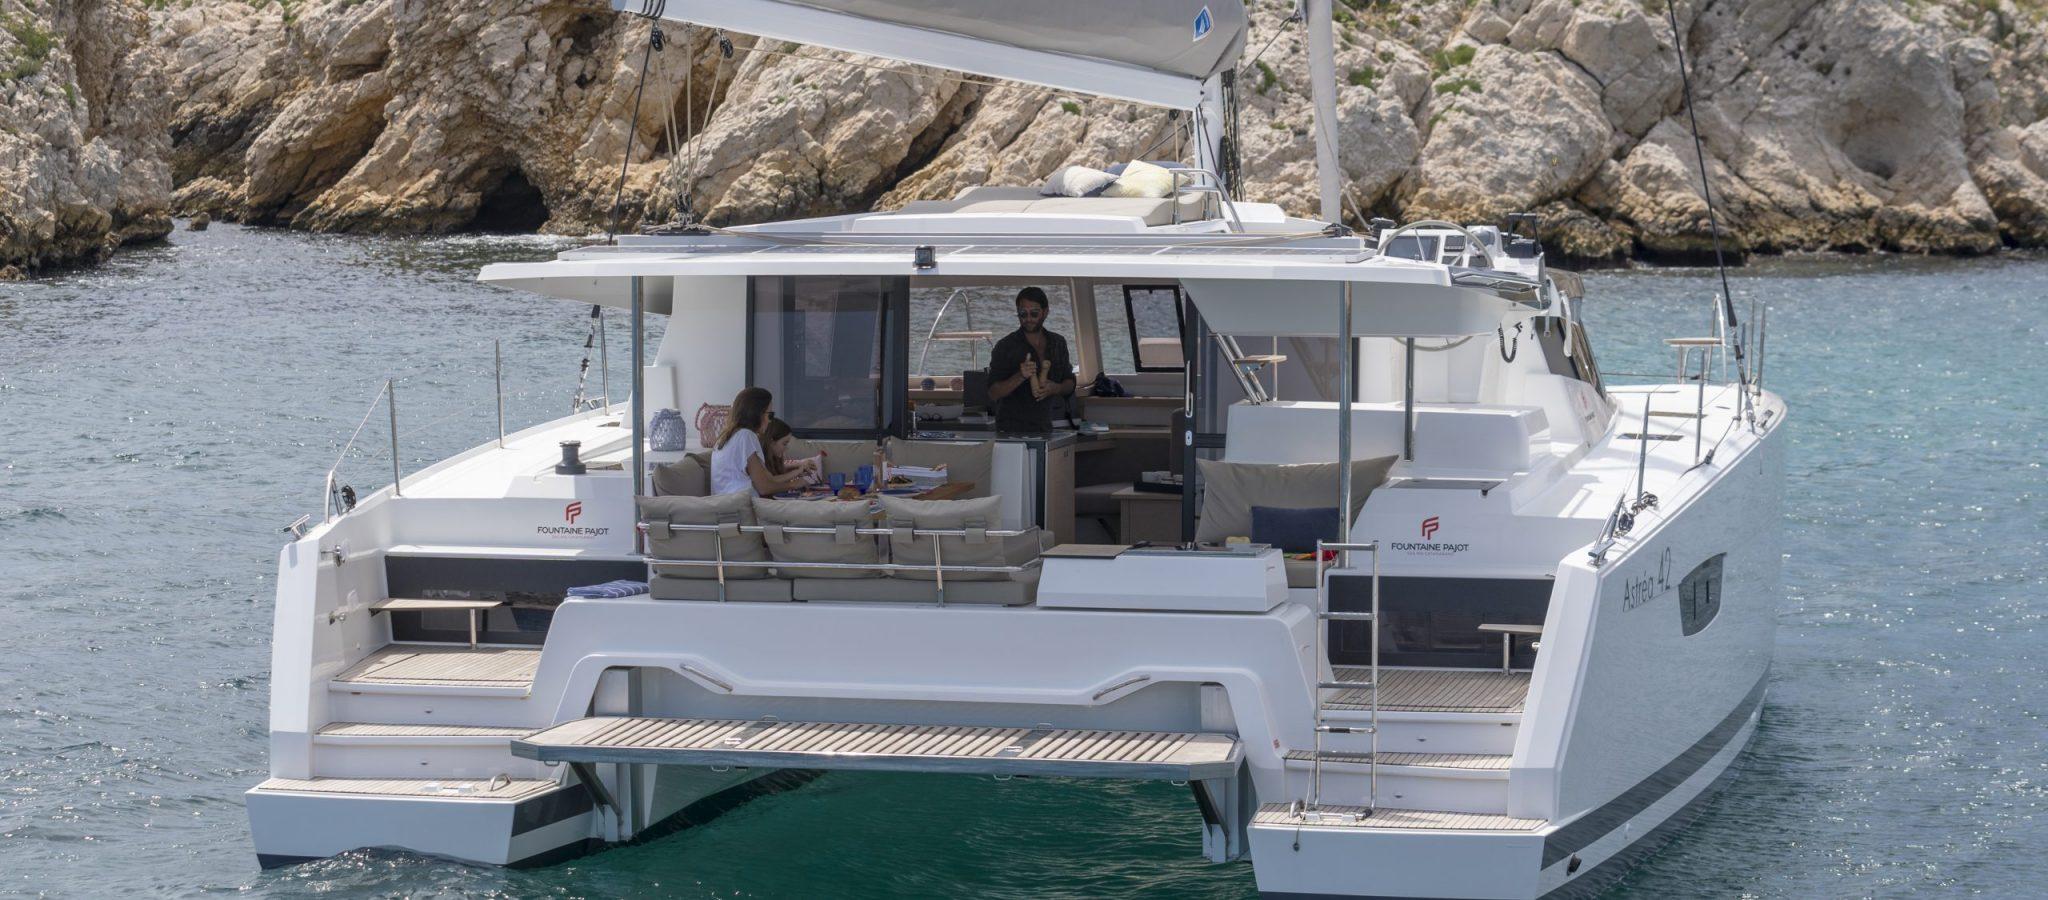 12/06/2018, Marseille (FRA,13), Chantier Fountaine-Pajot, Astrea 42